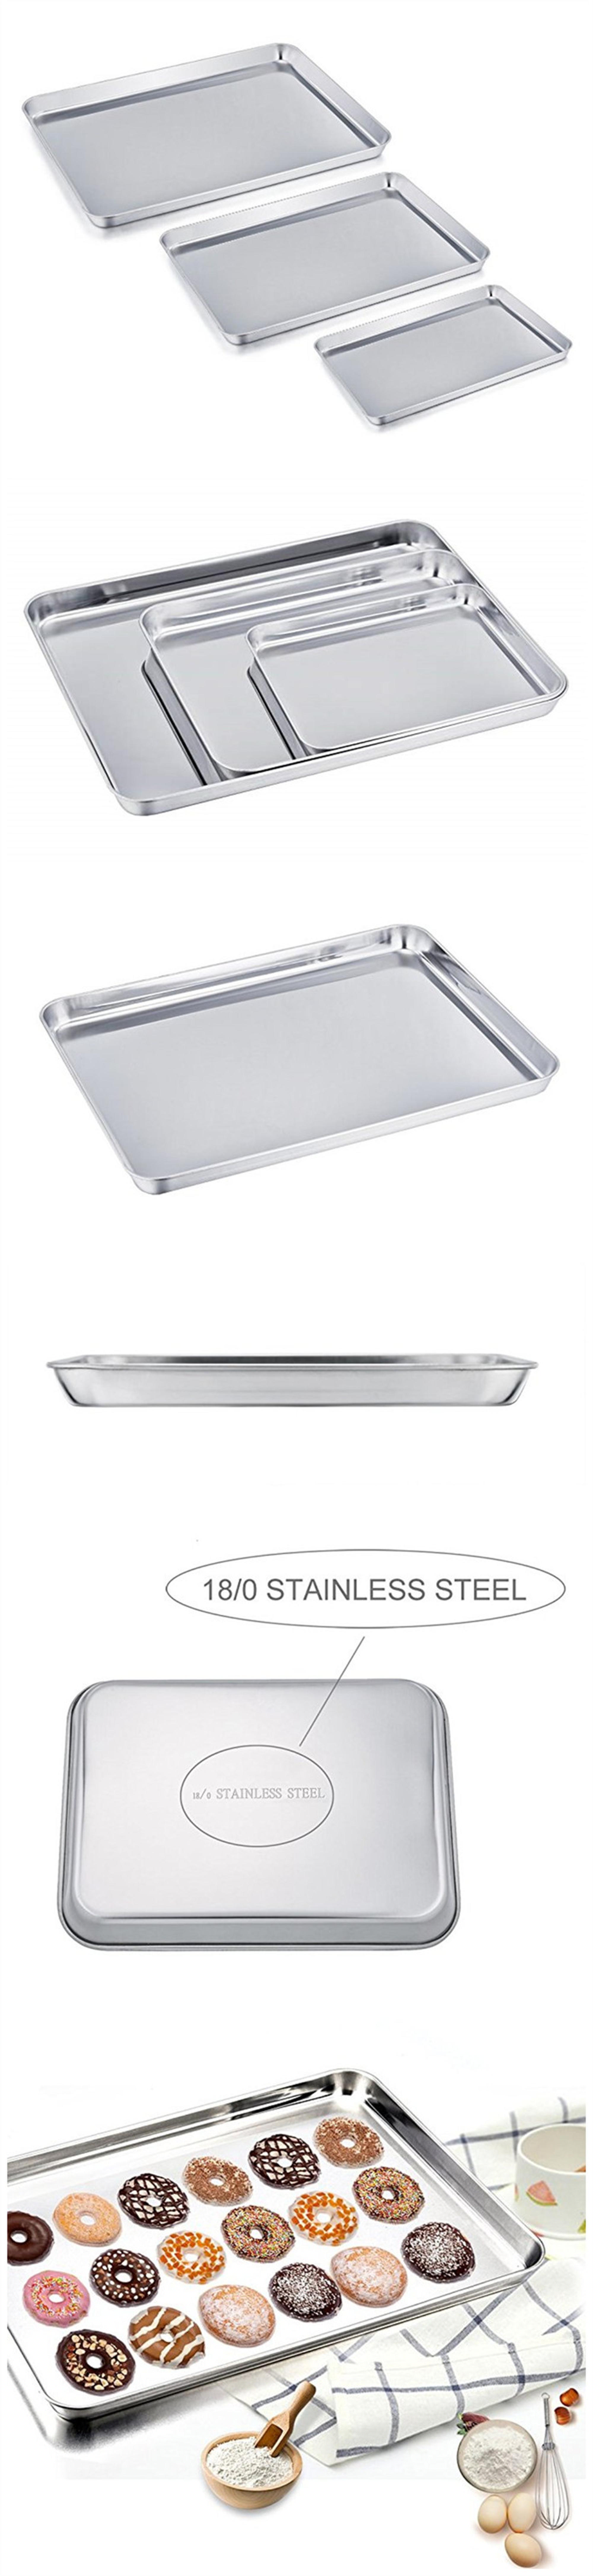 Stainless Steel Adjustable Shallow Bread Cookie Baking Sheet Pan Set